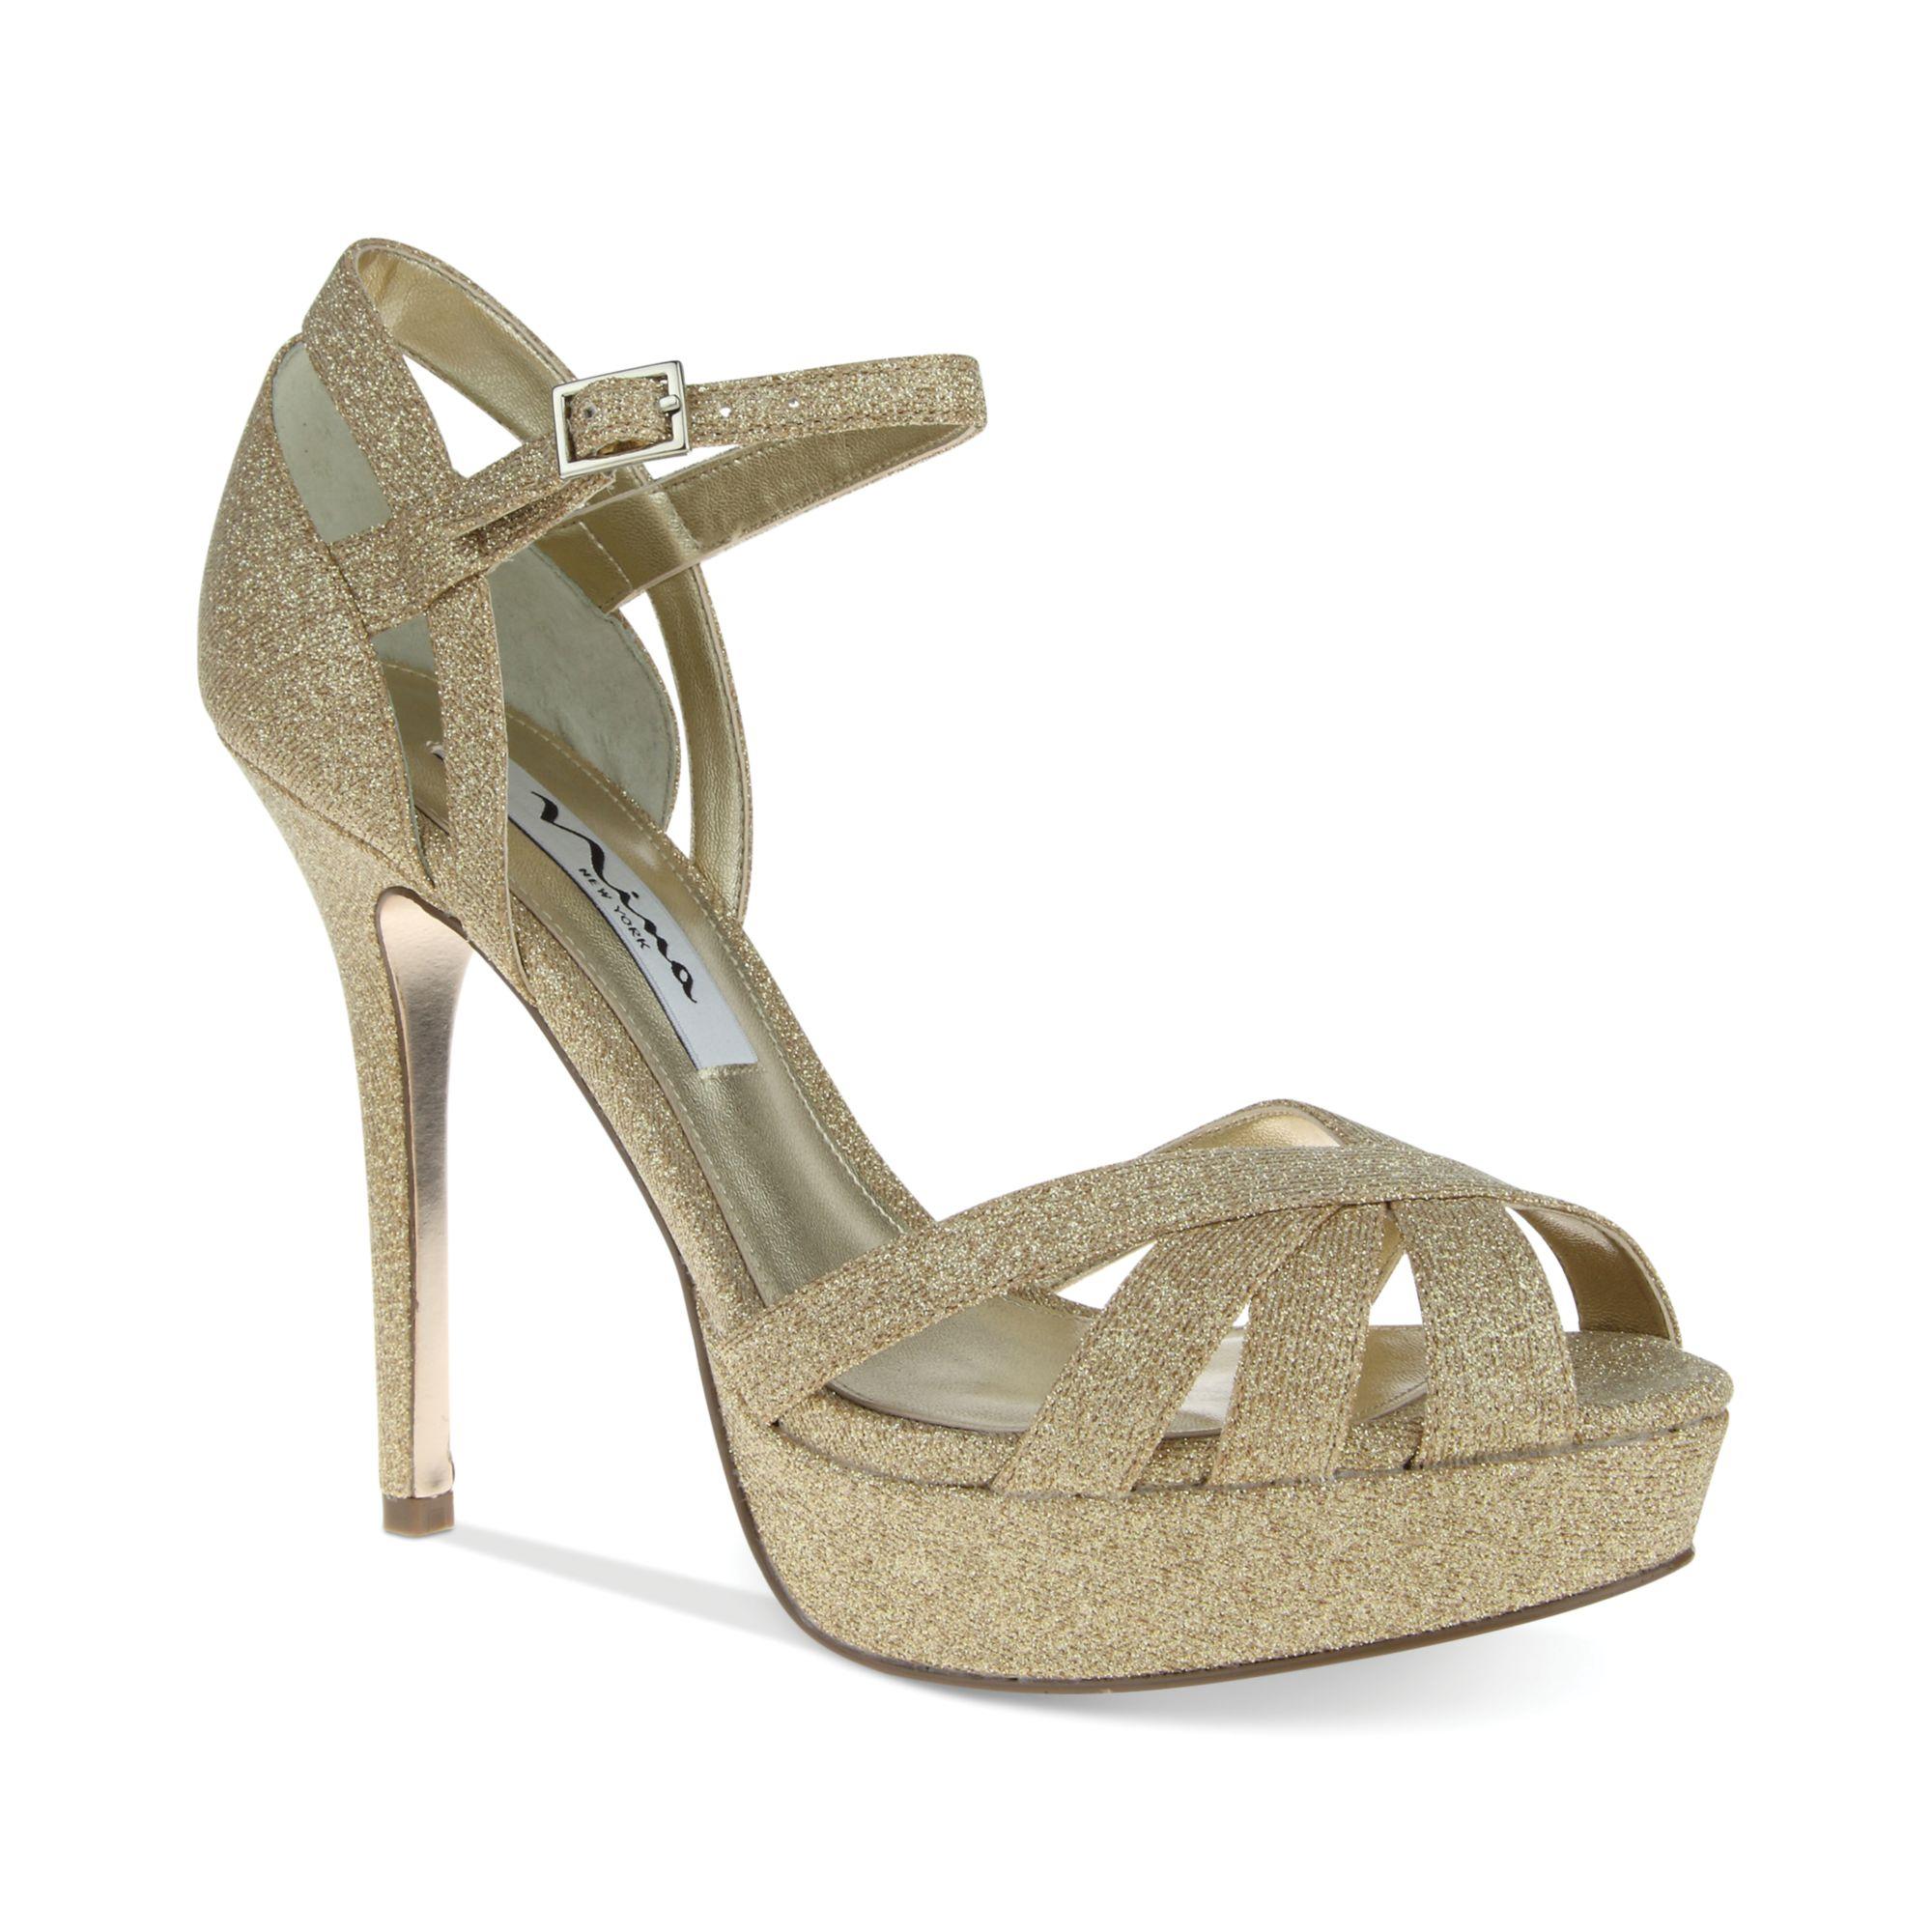 senora platform evening sandals in gold royal gold